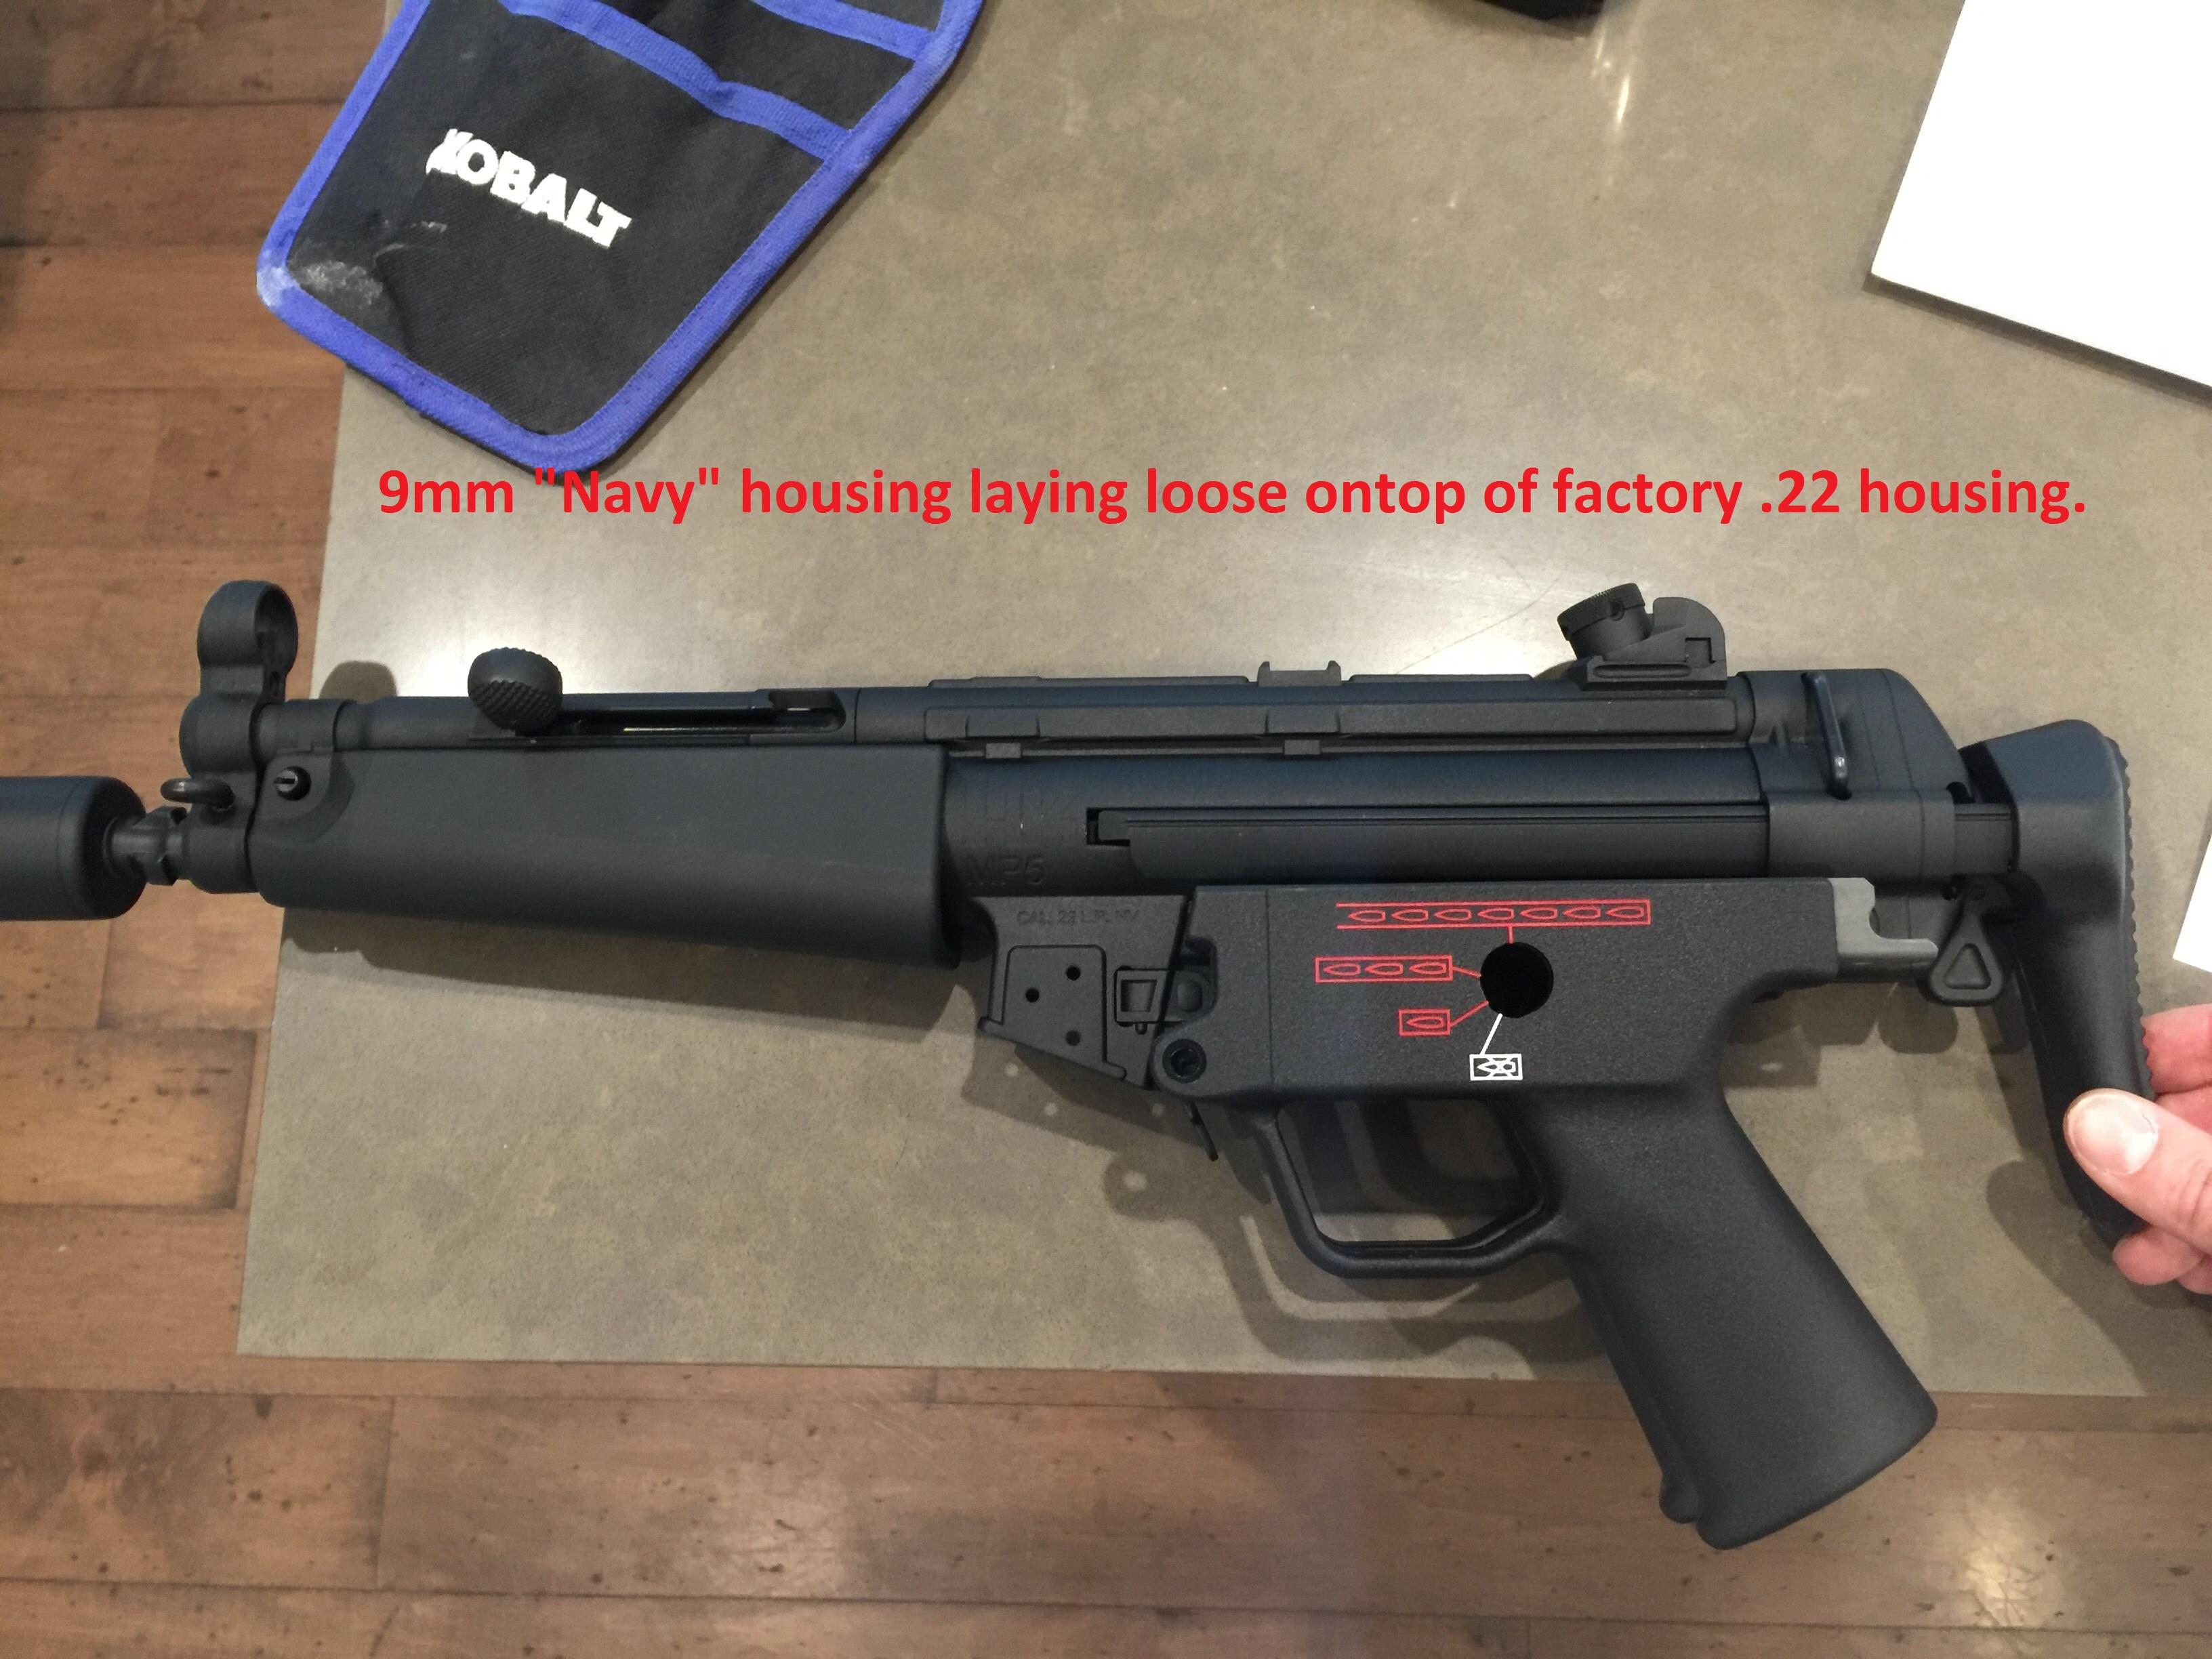 Adding genuine Navy trigger housing to Walther MP5-22-fullsizerender1.jpg